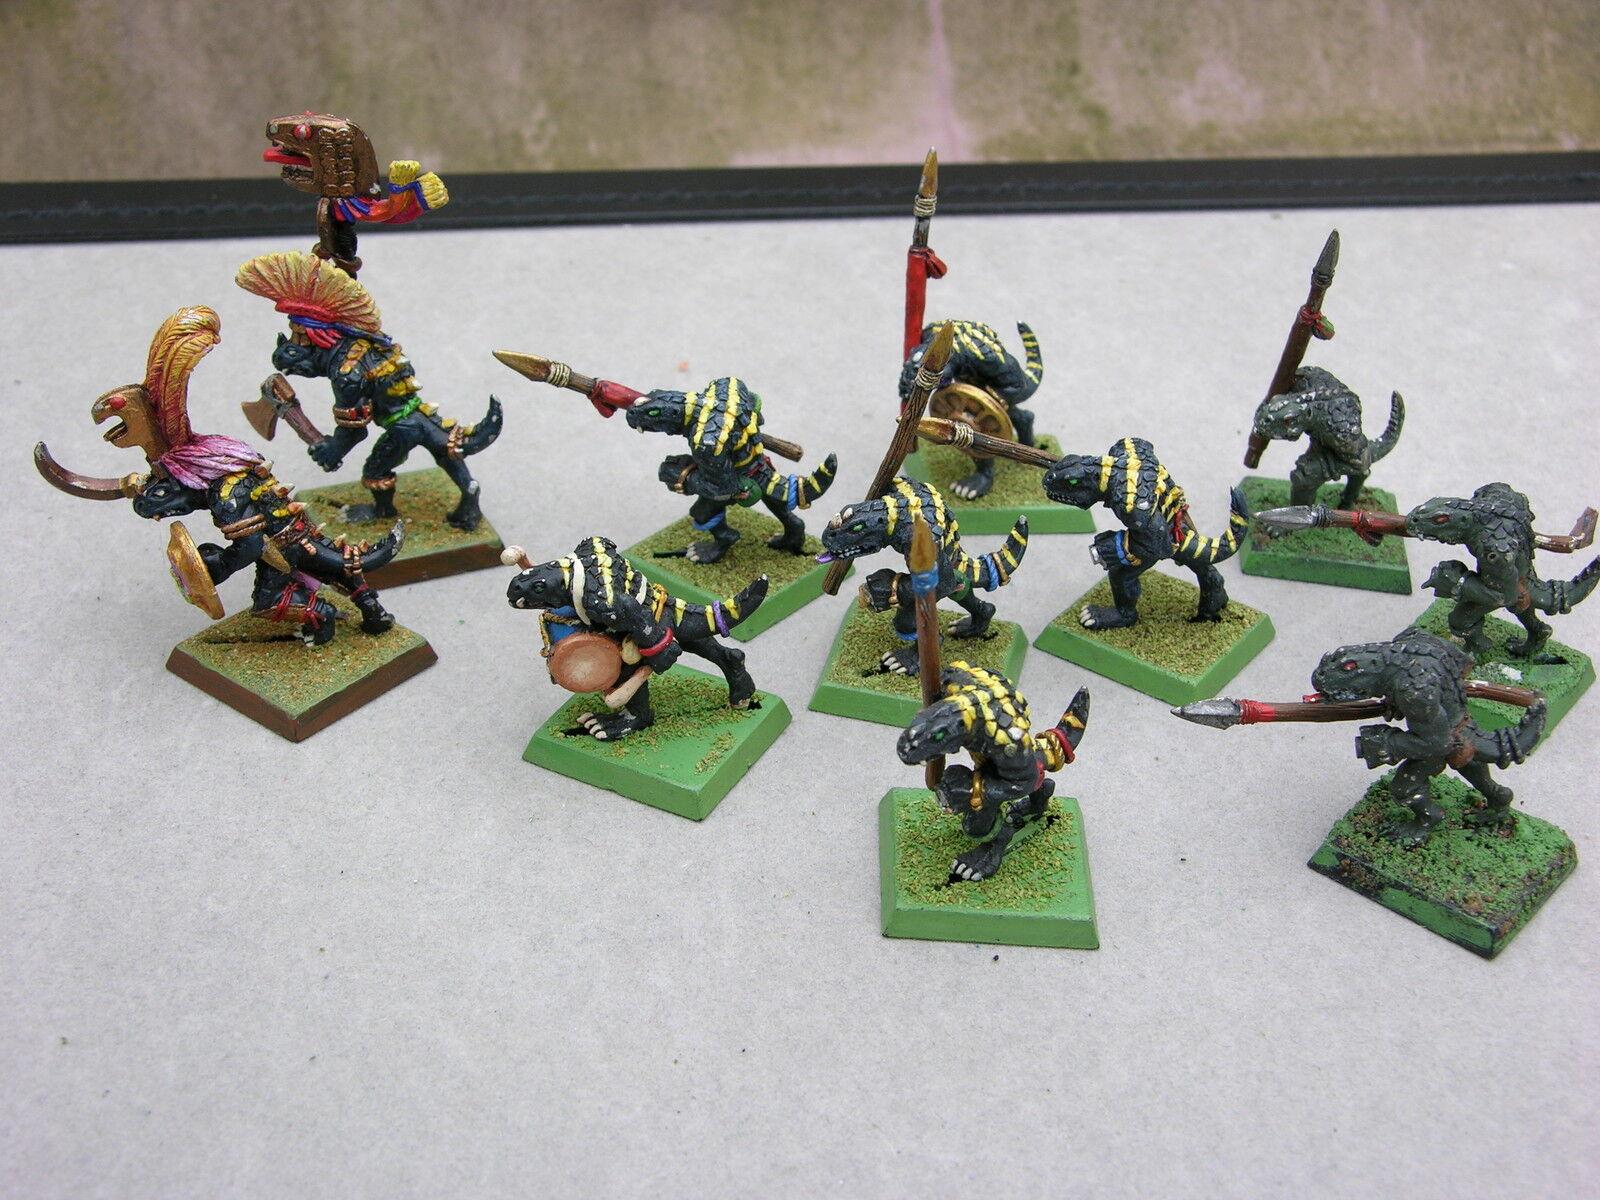 Warhammer Uomini Lucertola Sauri Plotone x11, Dipinto